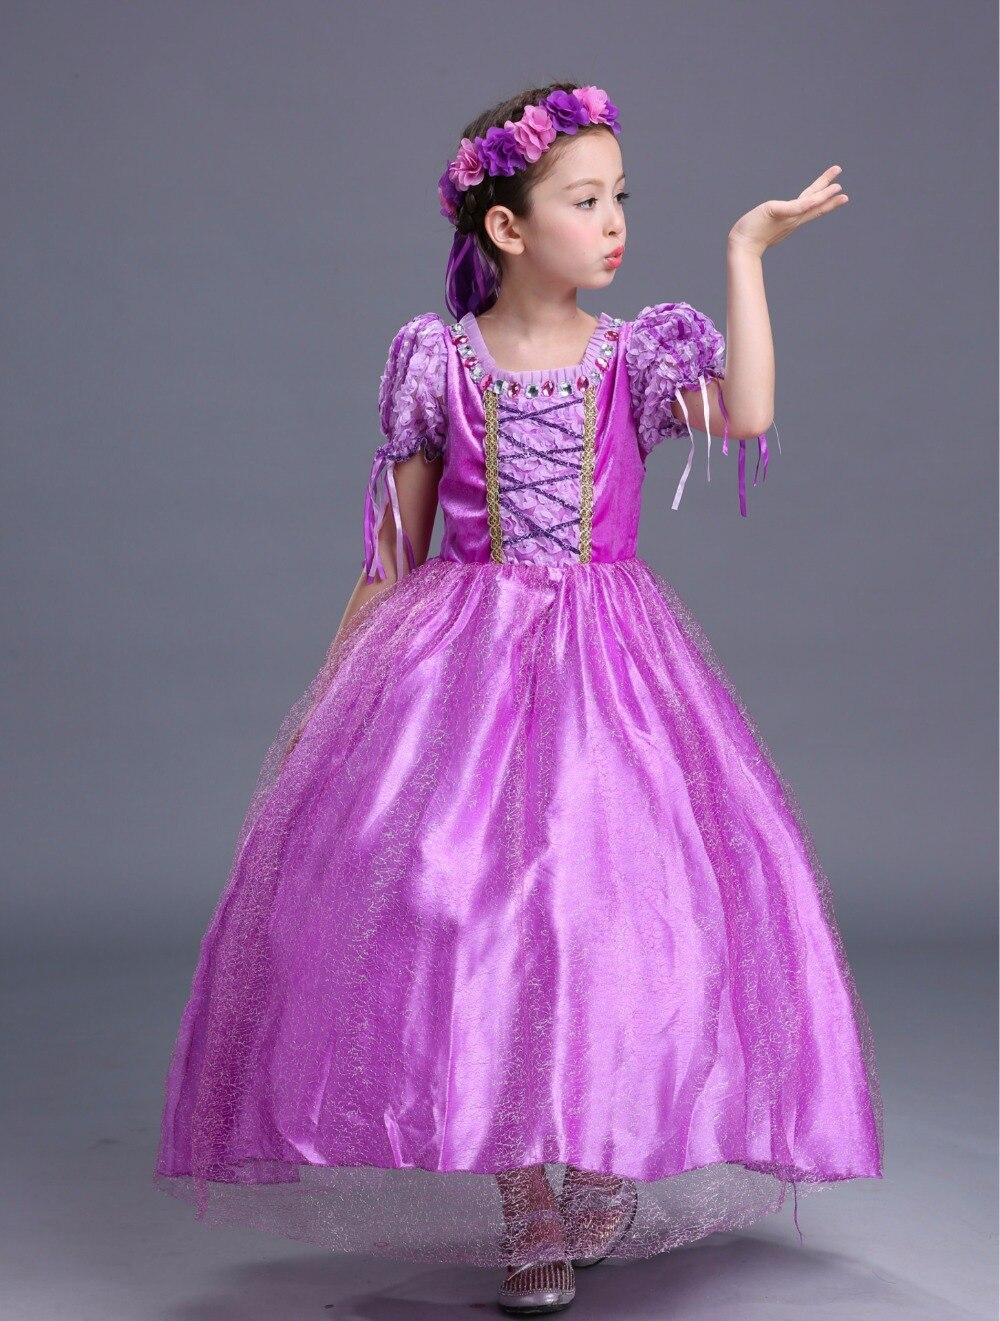 Moda prinsessenjurken meisjes 2 a 13 AÑOS NIÑOS Rapunzel Cosplay ...